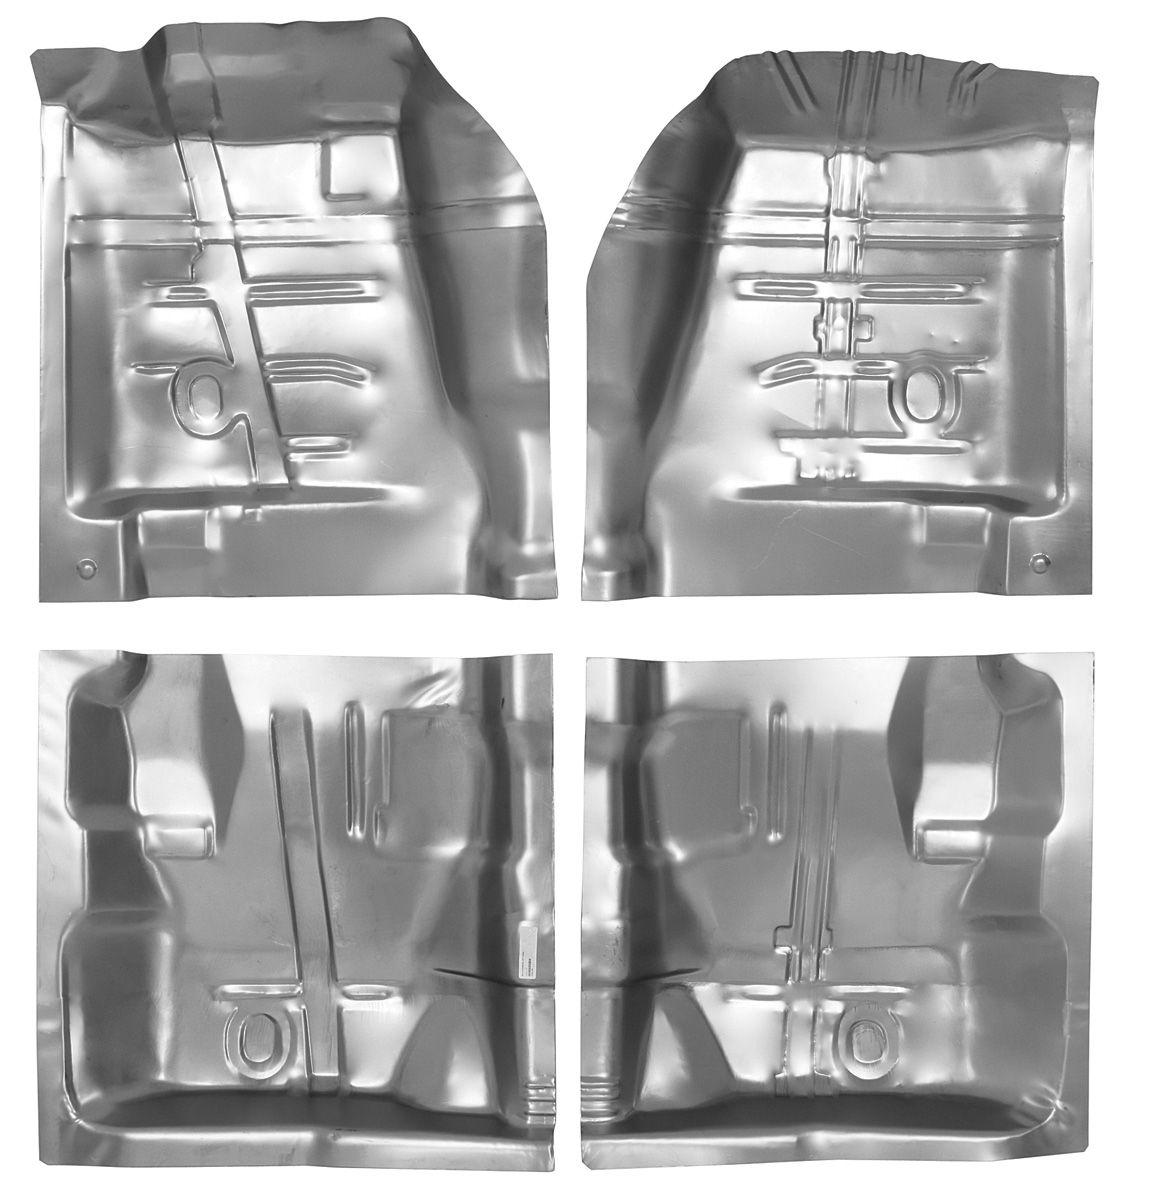 Cutlass 442 Floor Pan 1968 72 Steel 1 4 Sections Fits